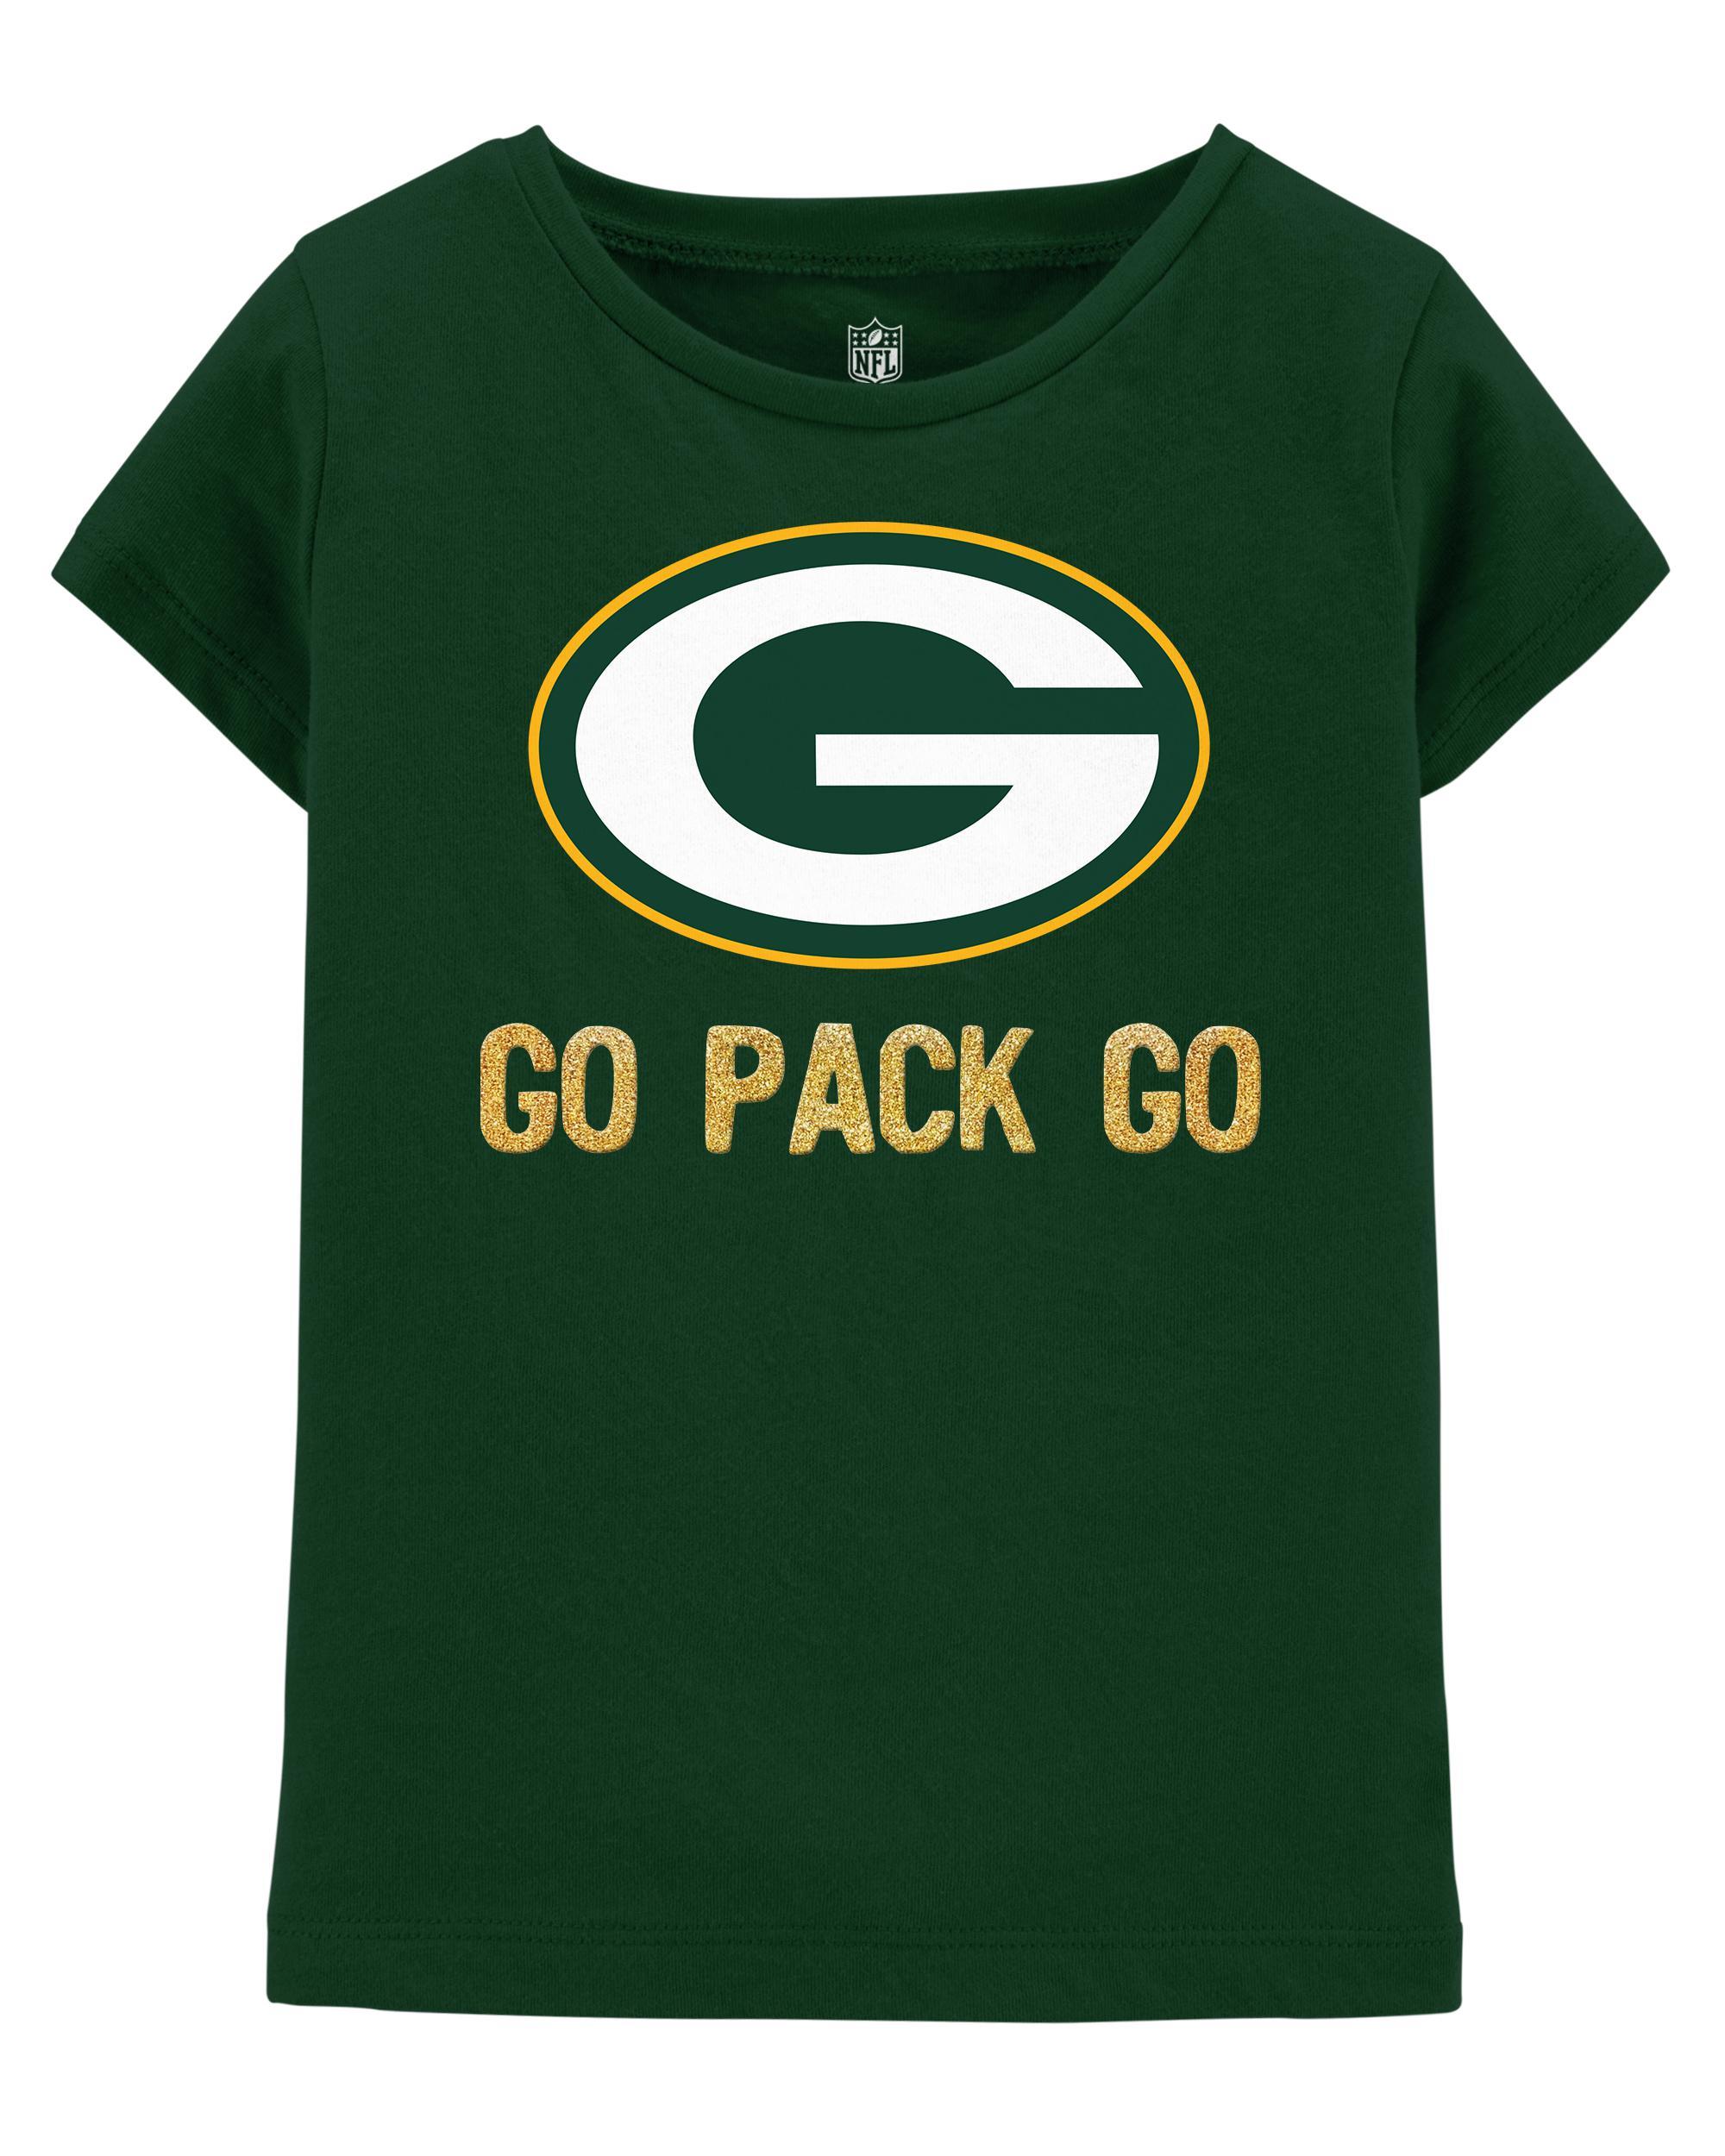 finest selection 0d885 ecebf NFL Green Bay Packers Glitter Tee | carters.com